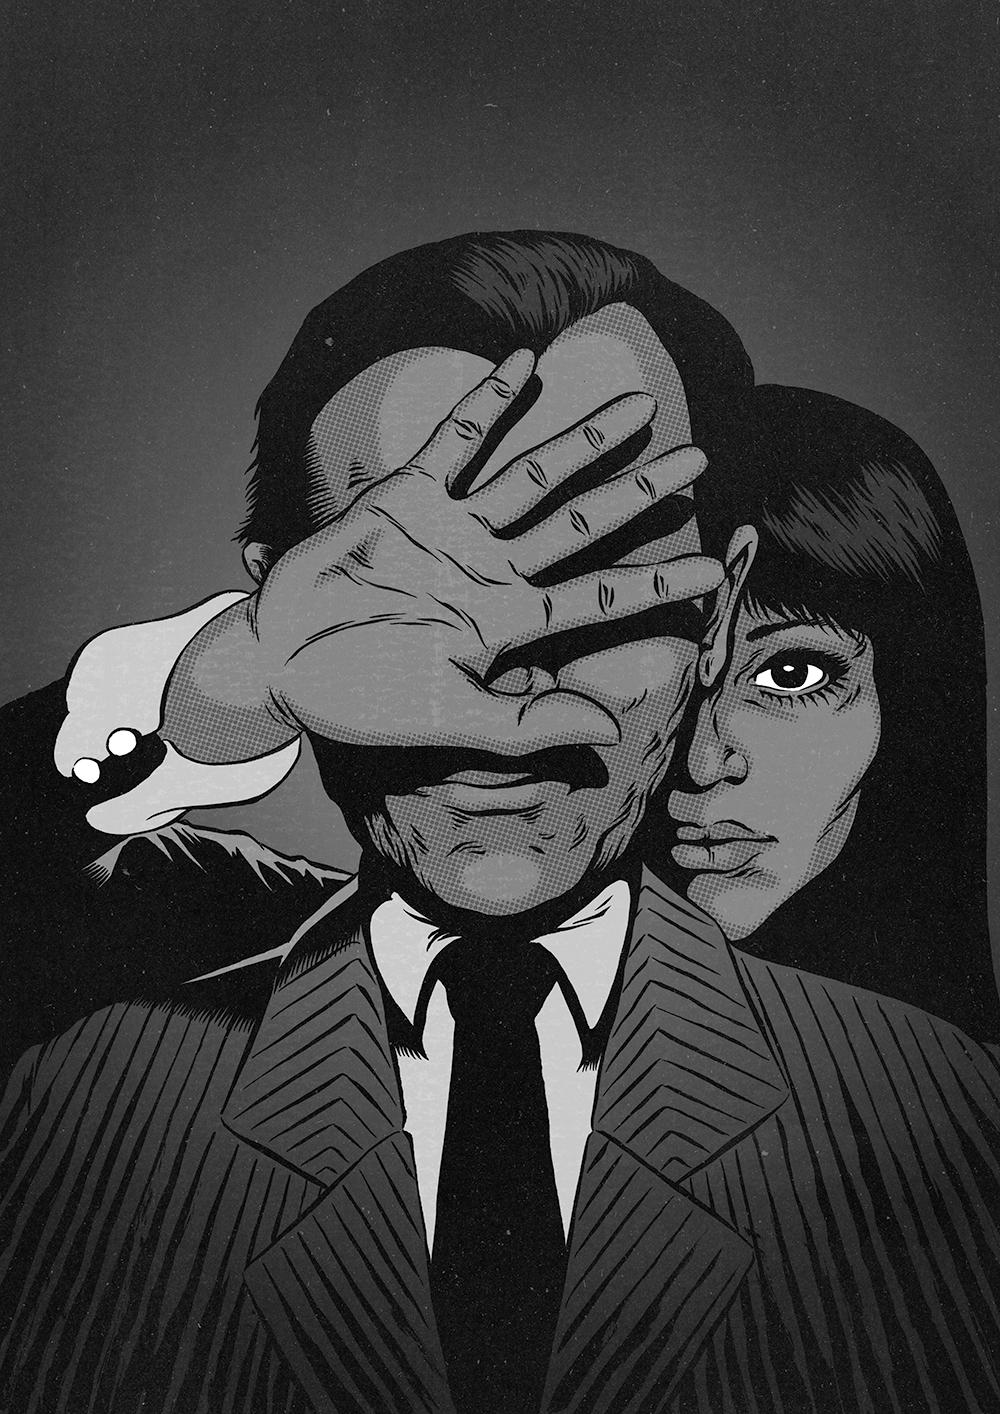 Jean-Luc Godard's Alphaville.